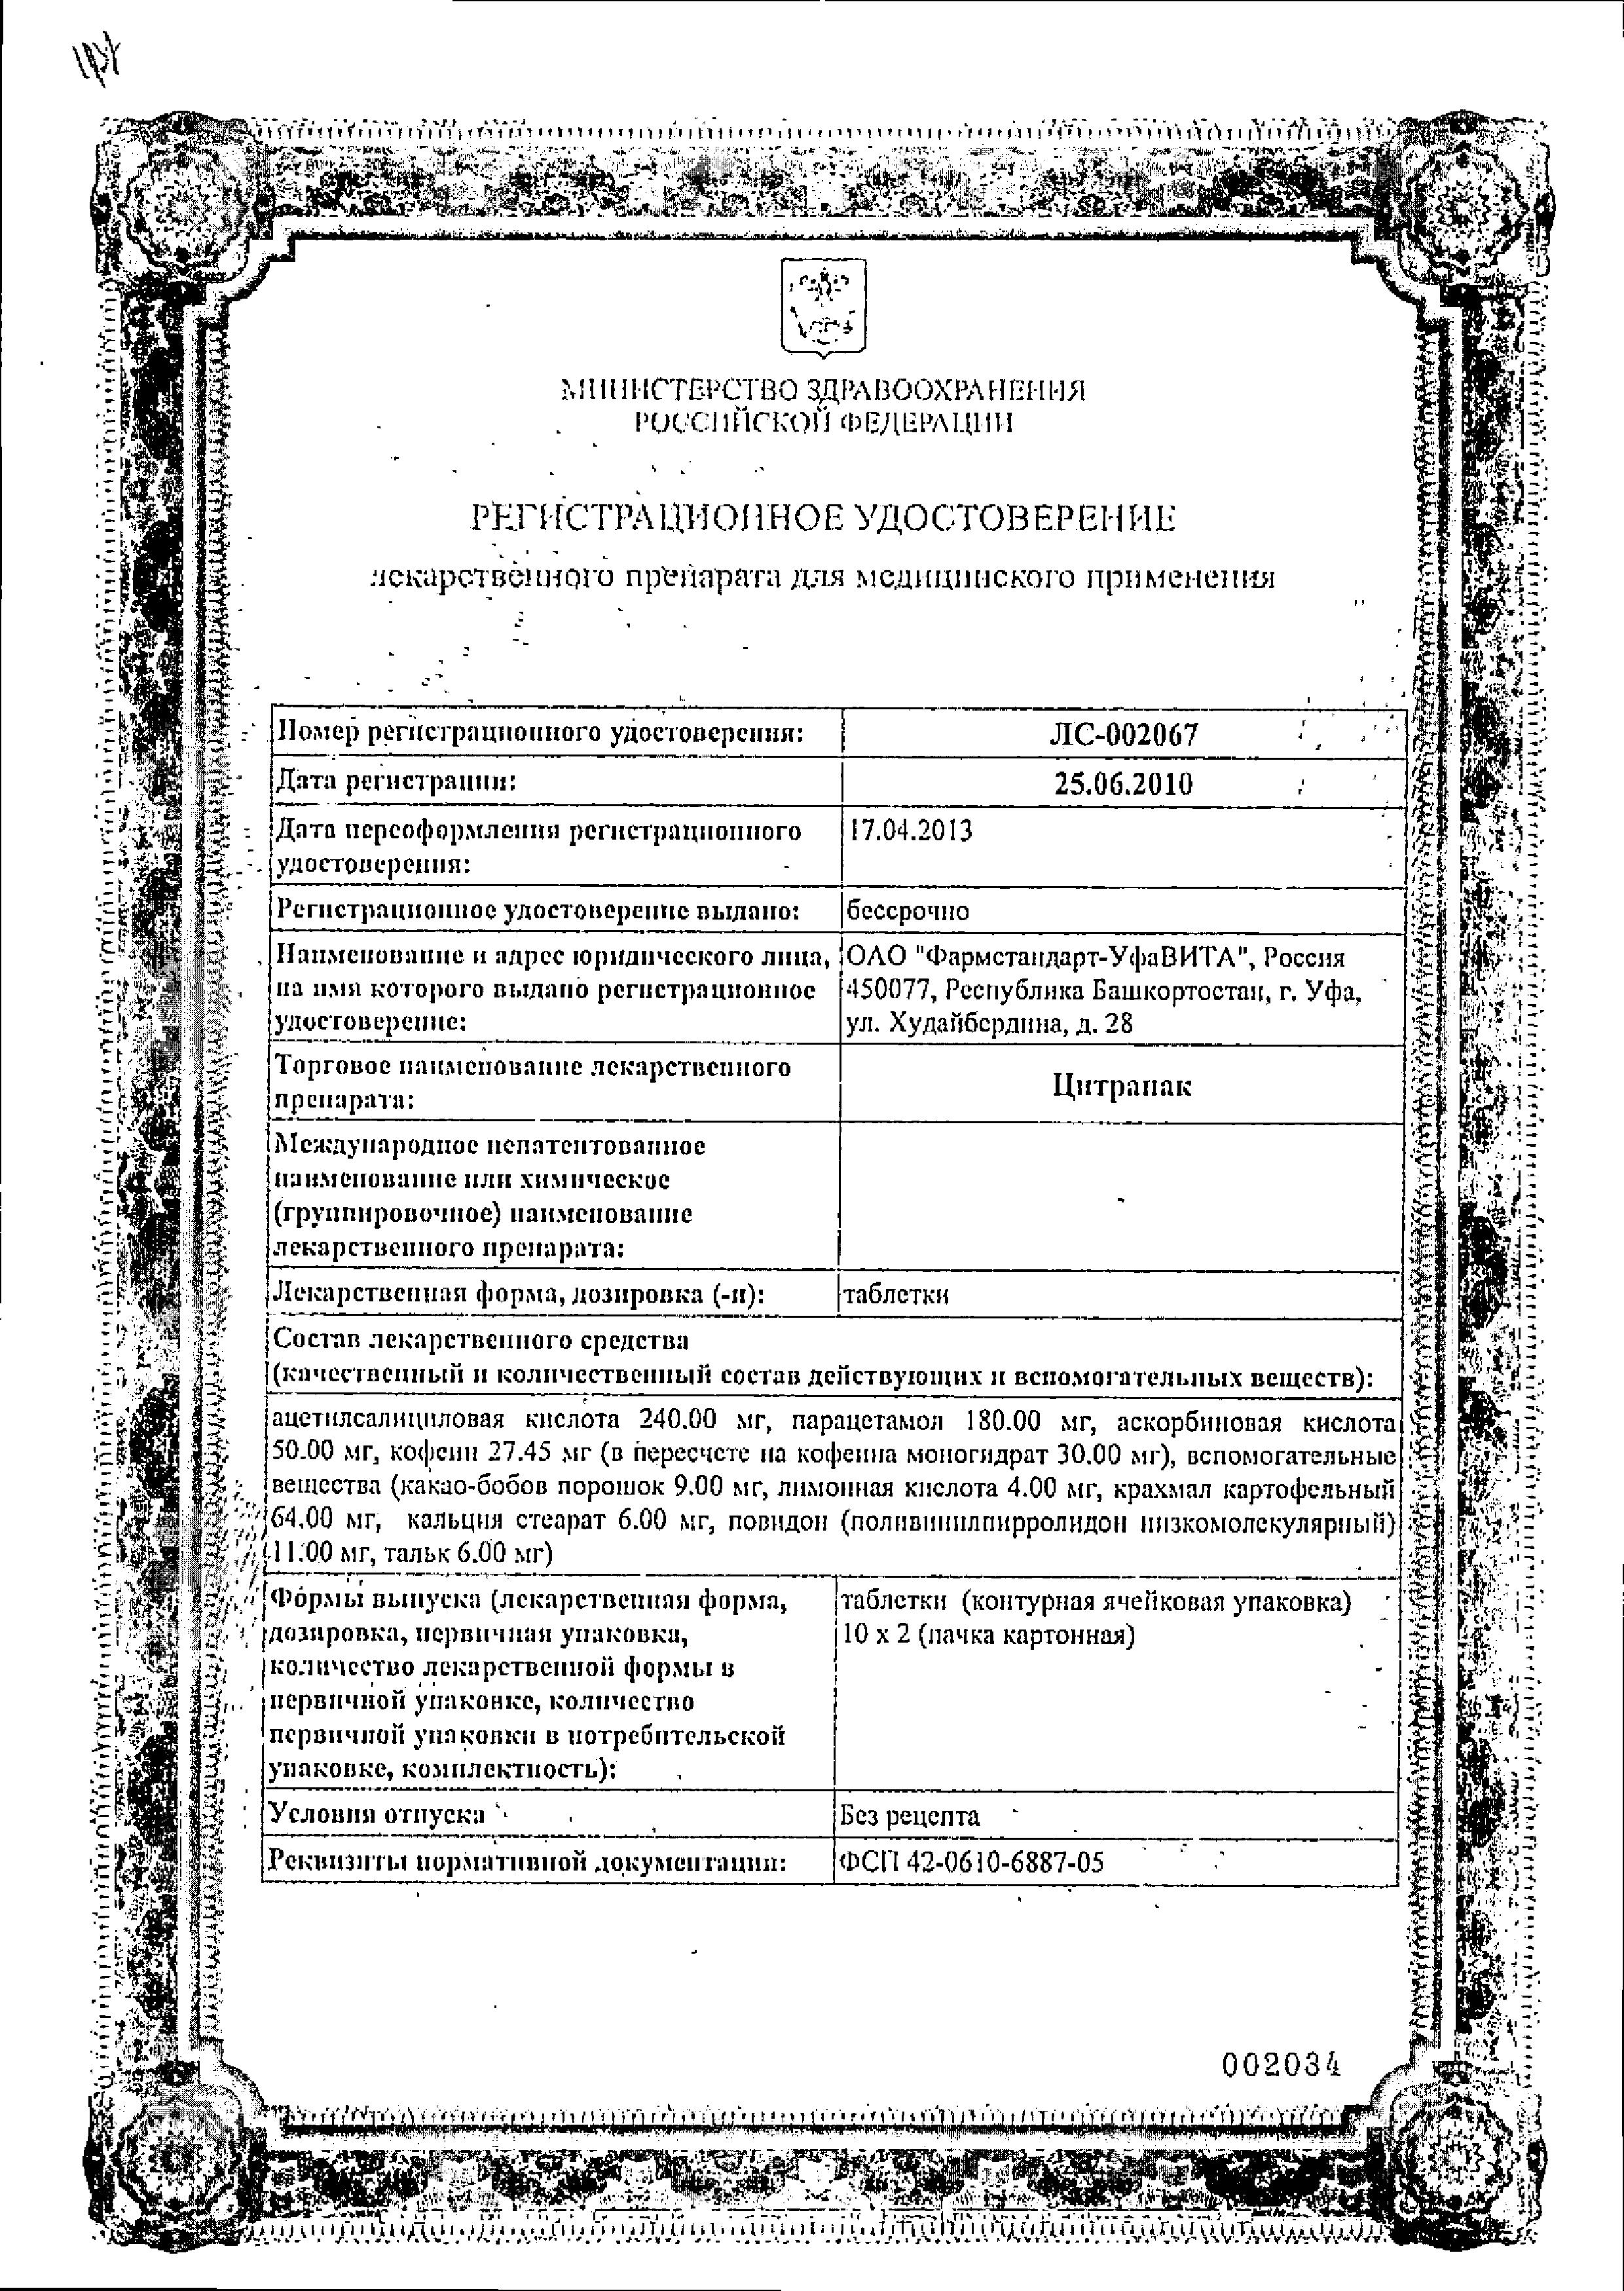 Цитрапак сертификат